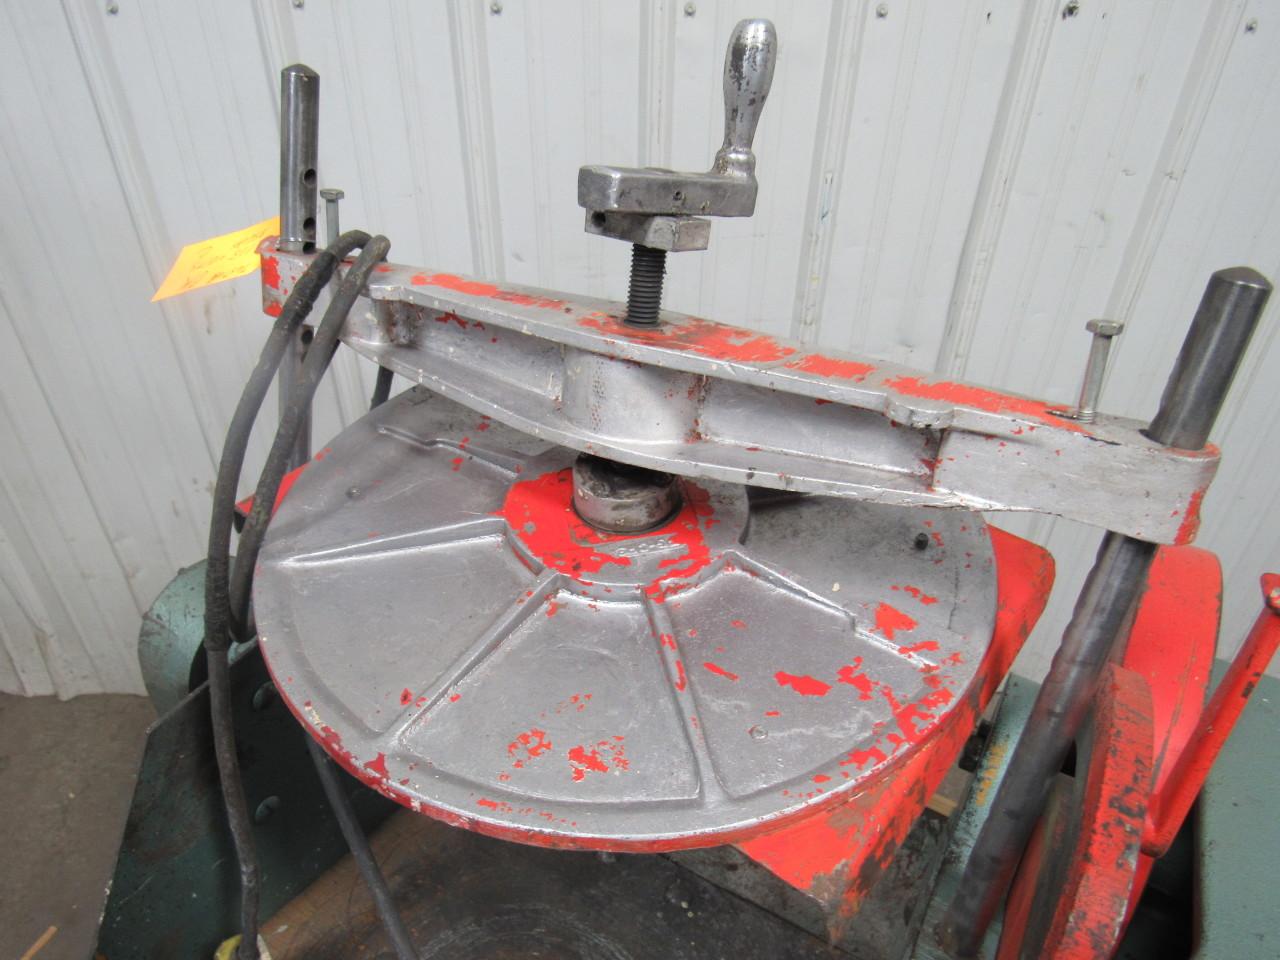 Miller mfg 1 5 gallon paint shaker mixer 115 208 230v for 5 gallon paint mixer